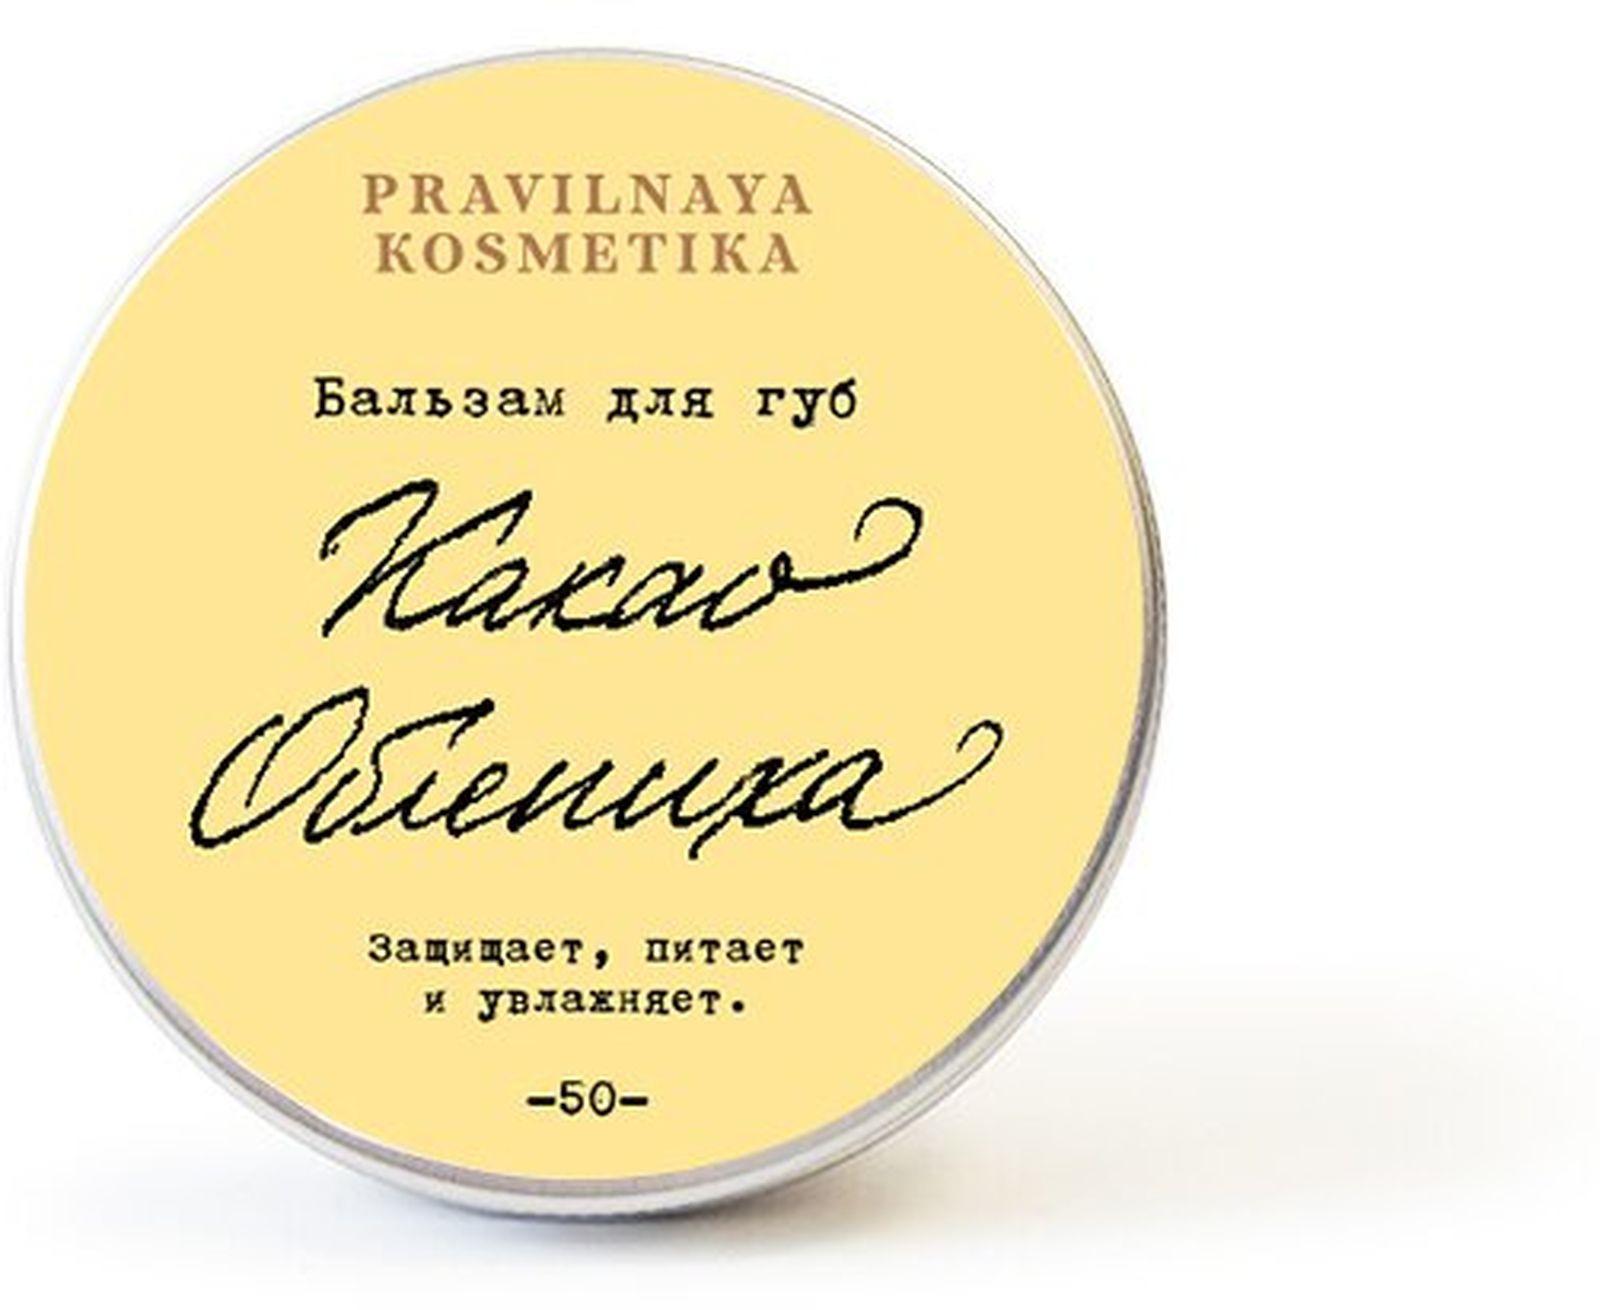 Бальзам для губ Pravilnaya Kosmetika Какао Облепиха, 10 мг PRAVILNAYA KOSMETIKA